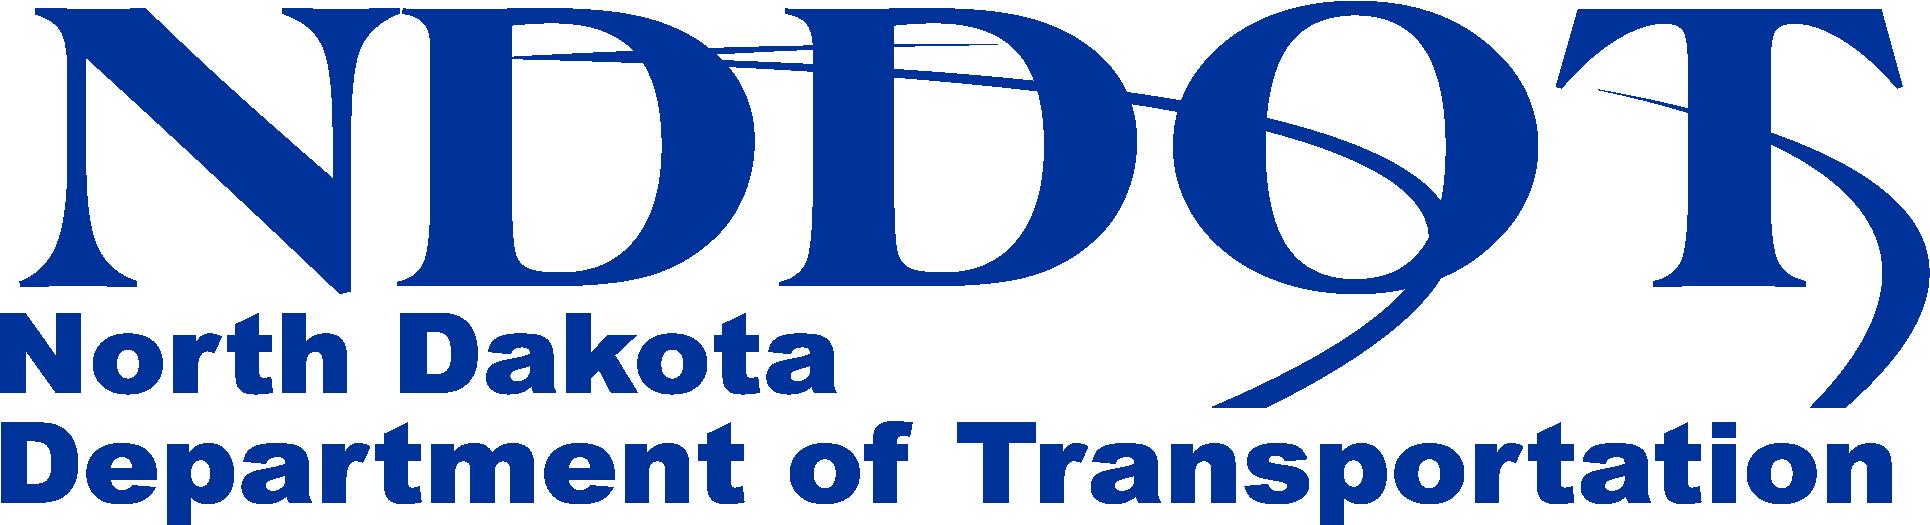 nddot-logo-blue.png